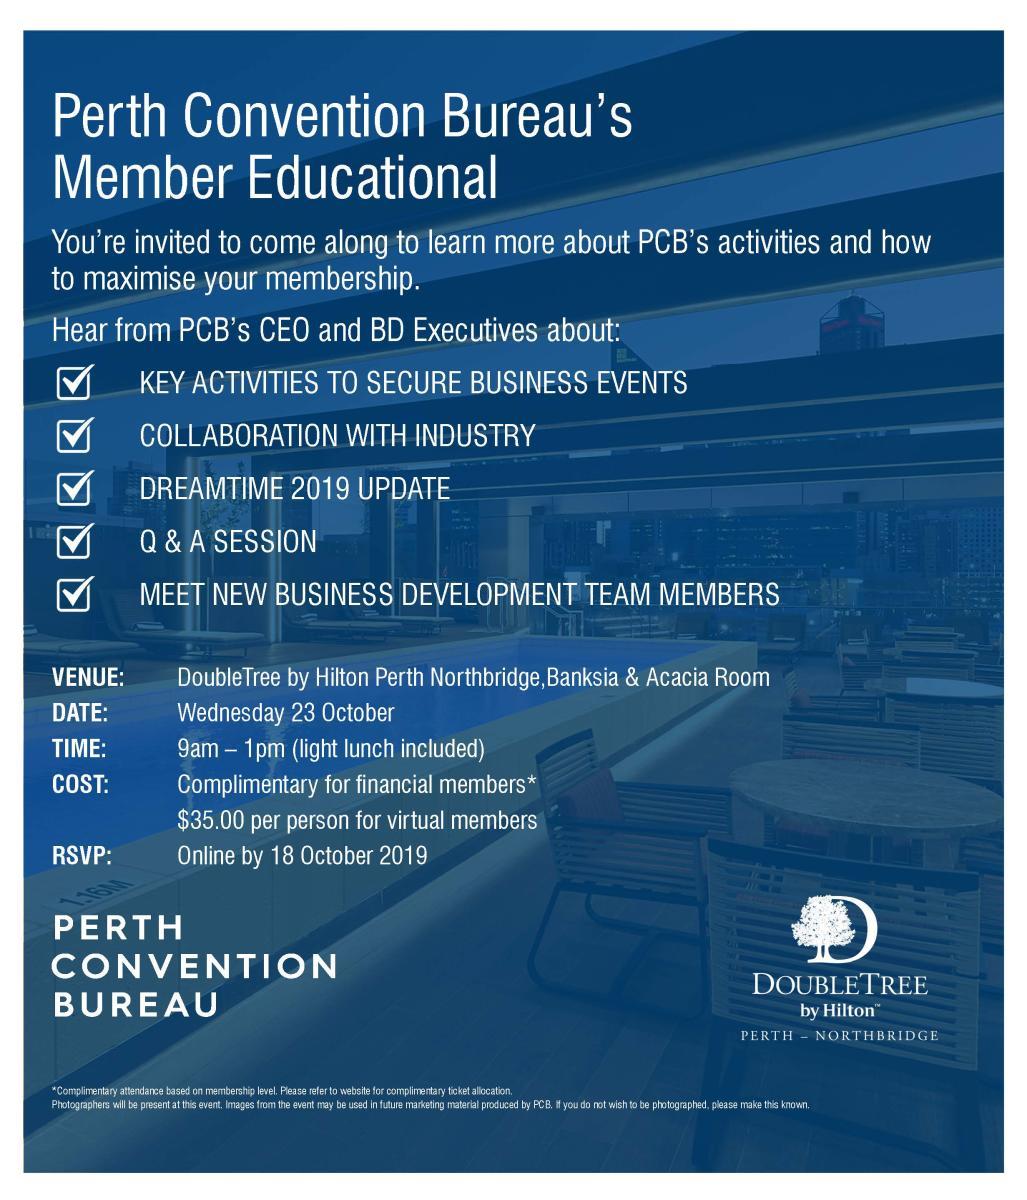 PCB Member Educational Invitation